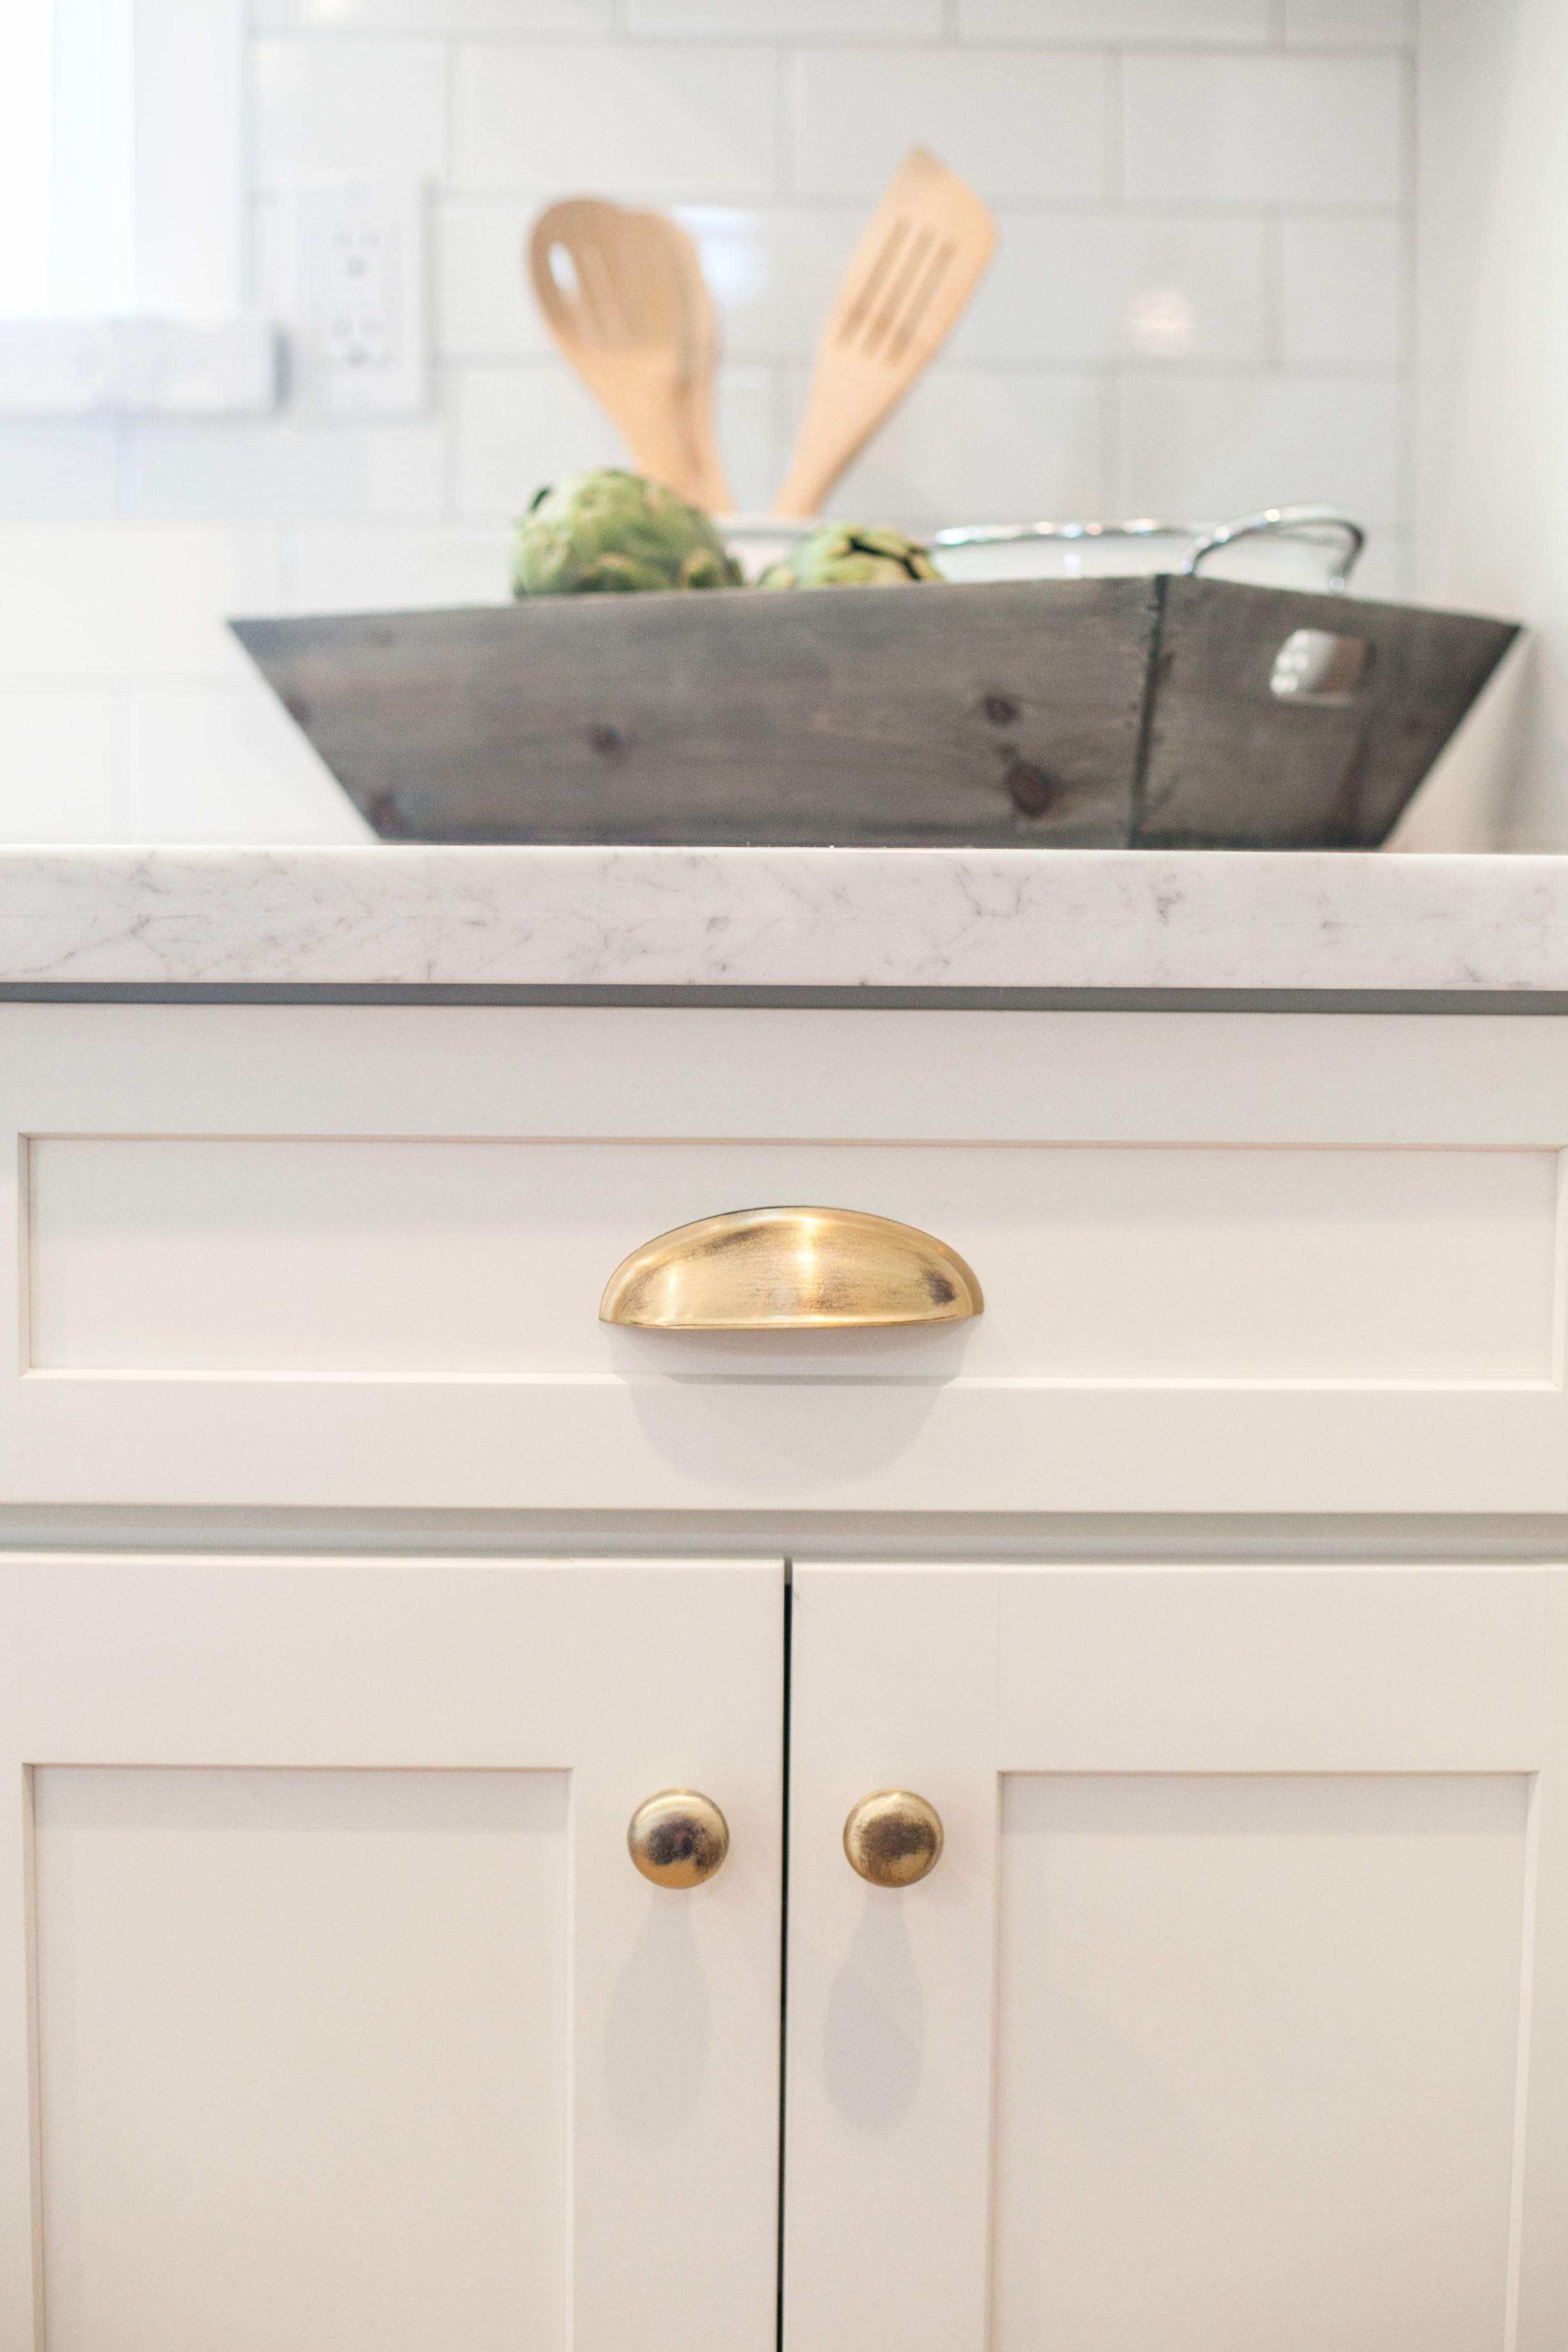 cabinet hardware phoenix - Komplette Kabinett-Resurfacing Mit dem ...